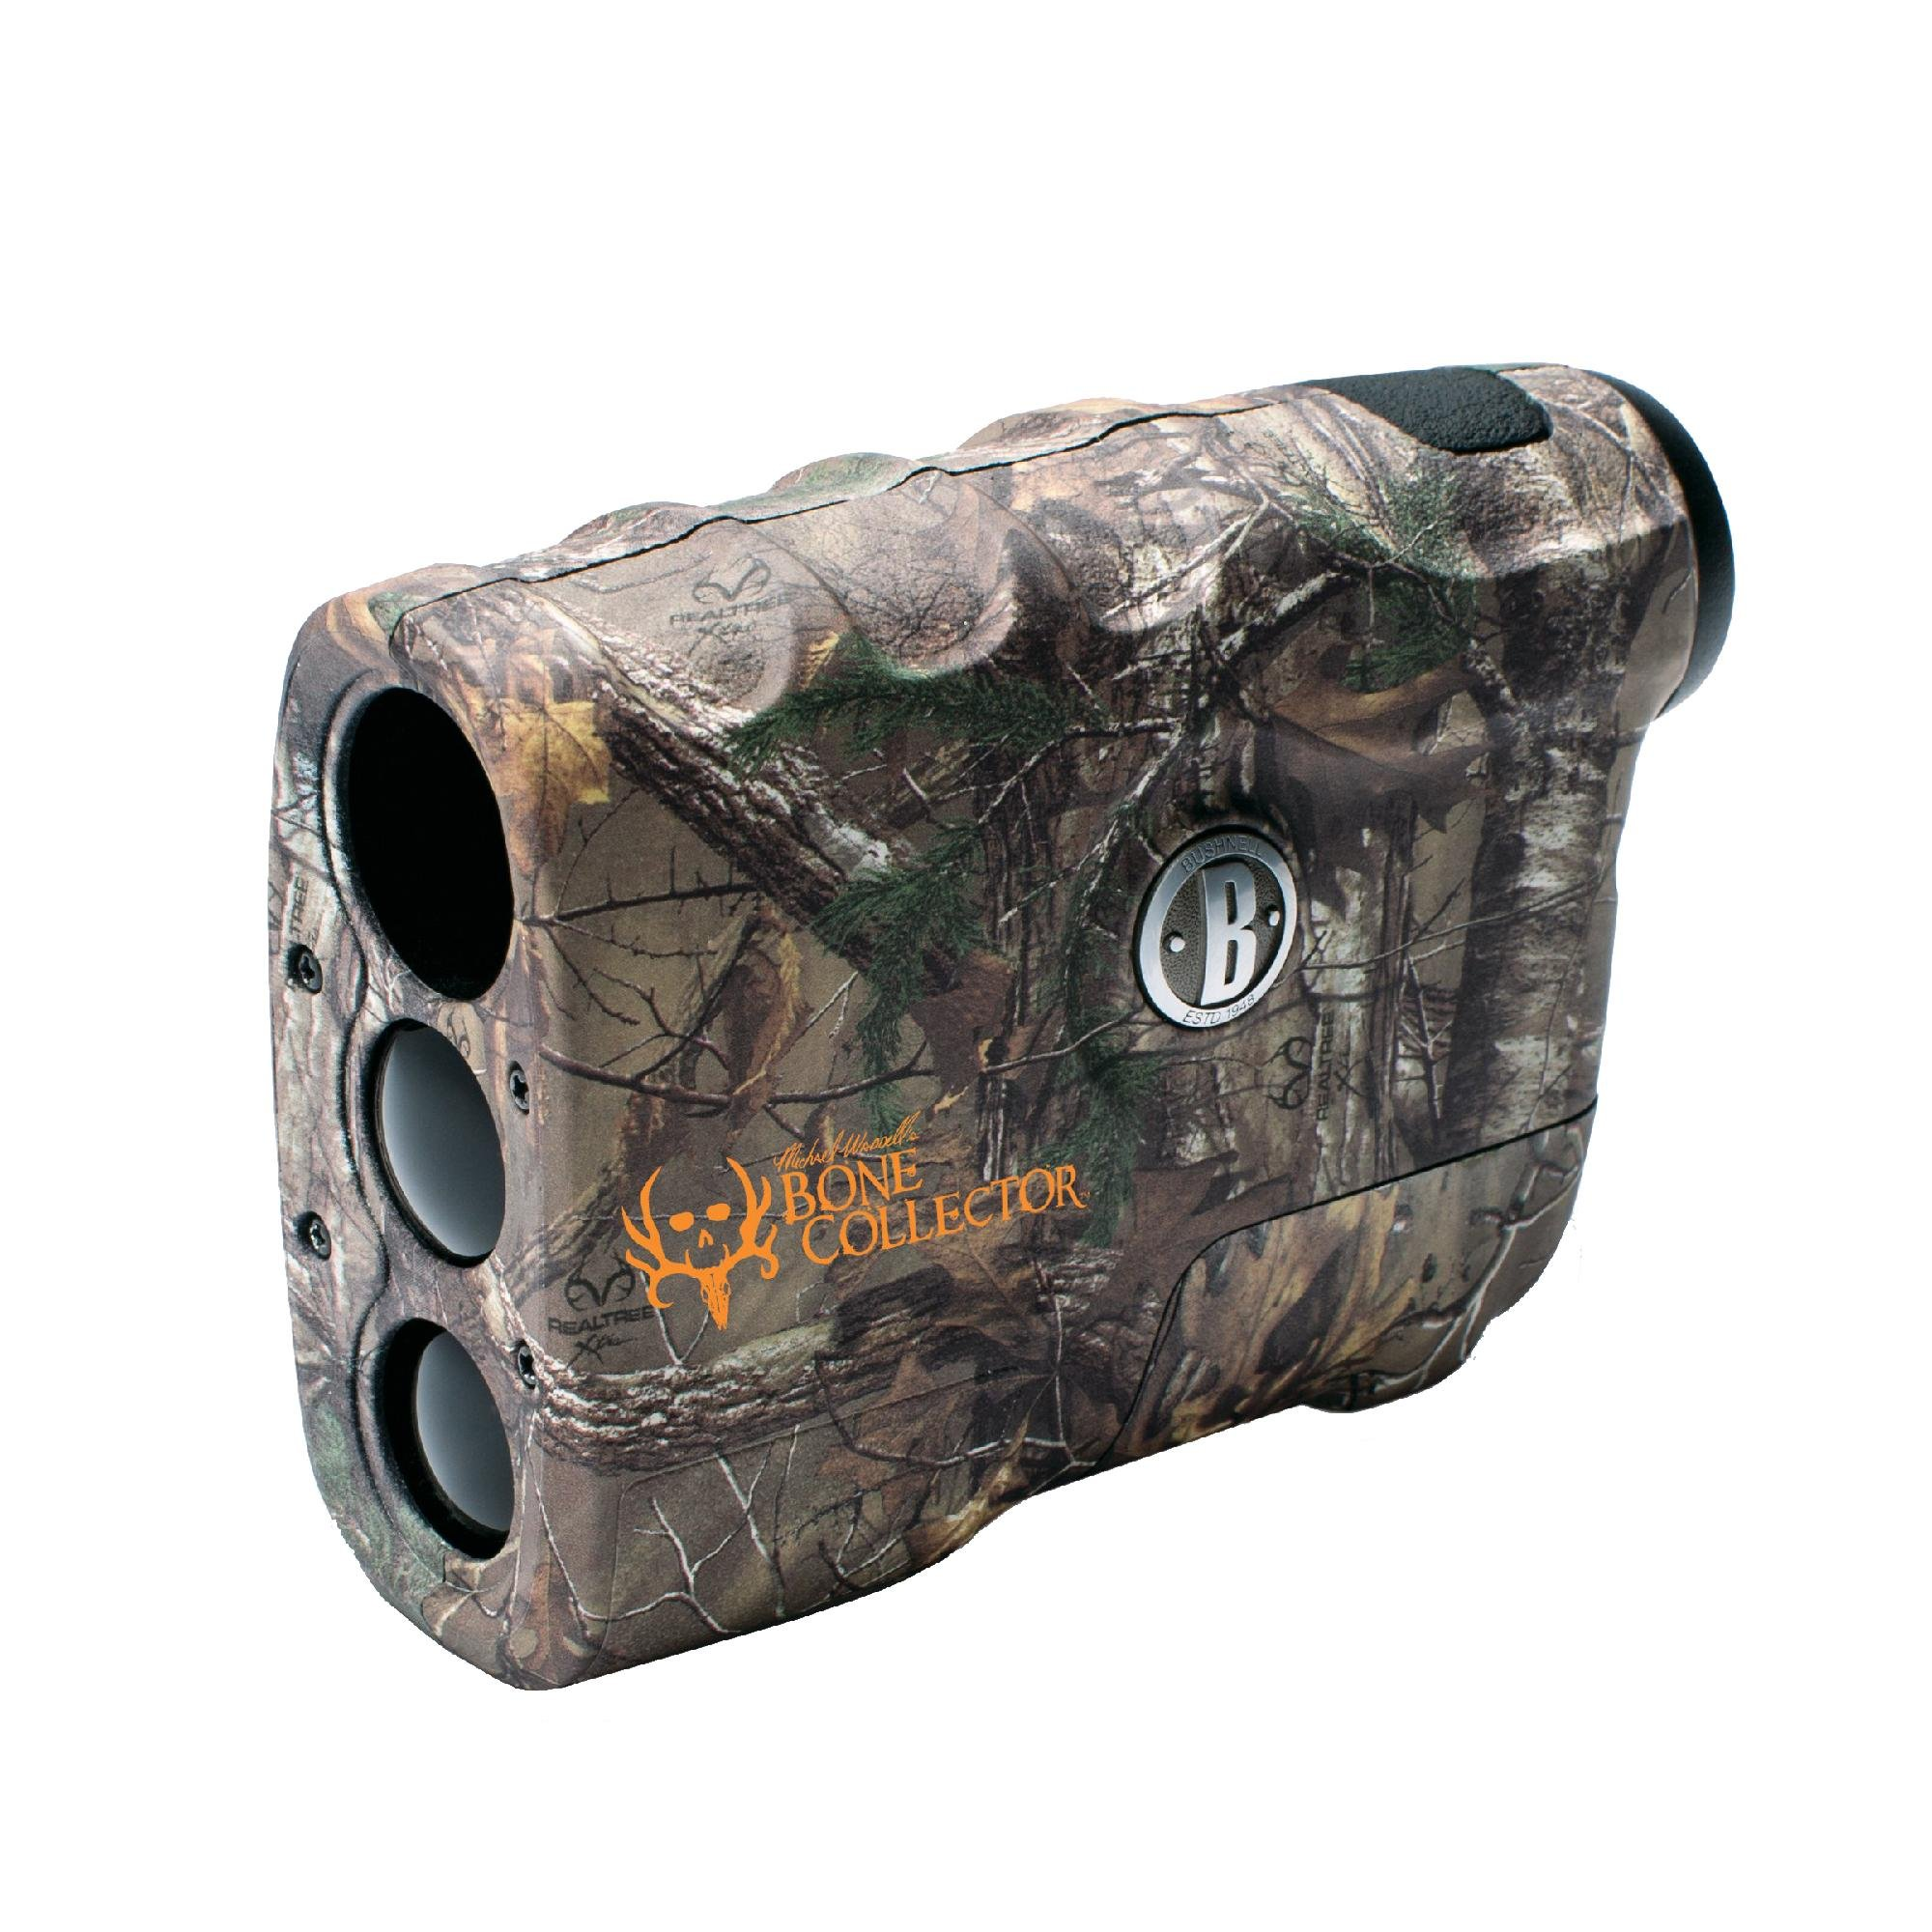 Bushnell Bone Collector Laser Rangefinder 4x20-RealTree Xtra by Bushnell